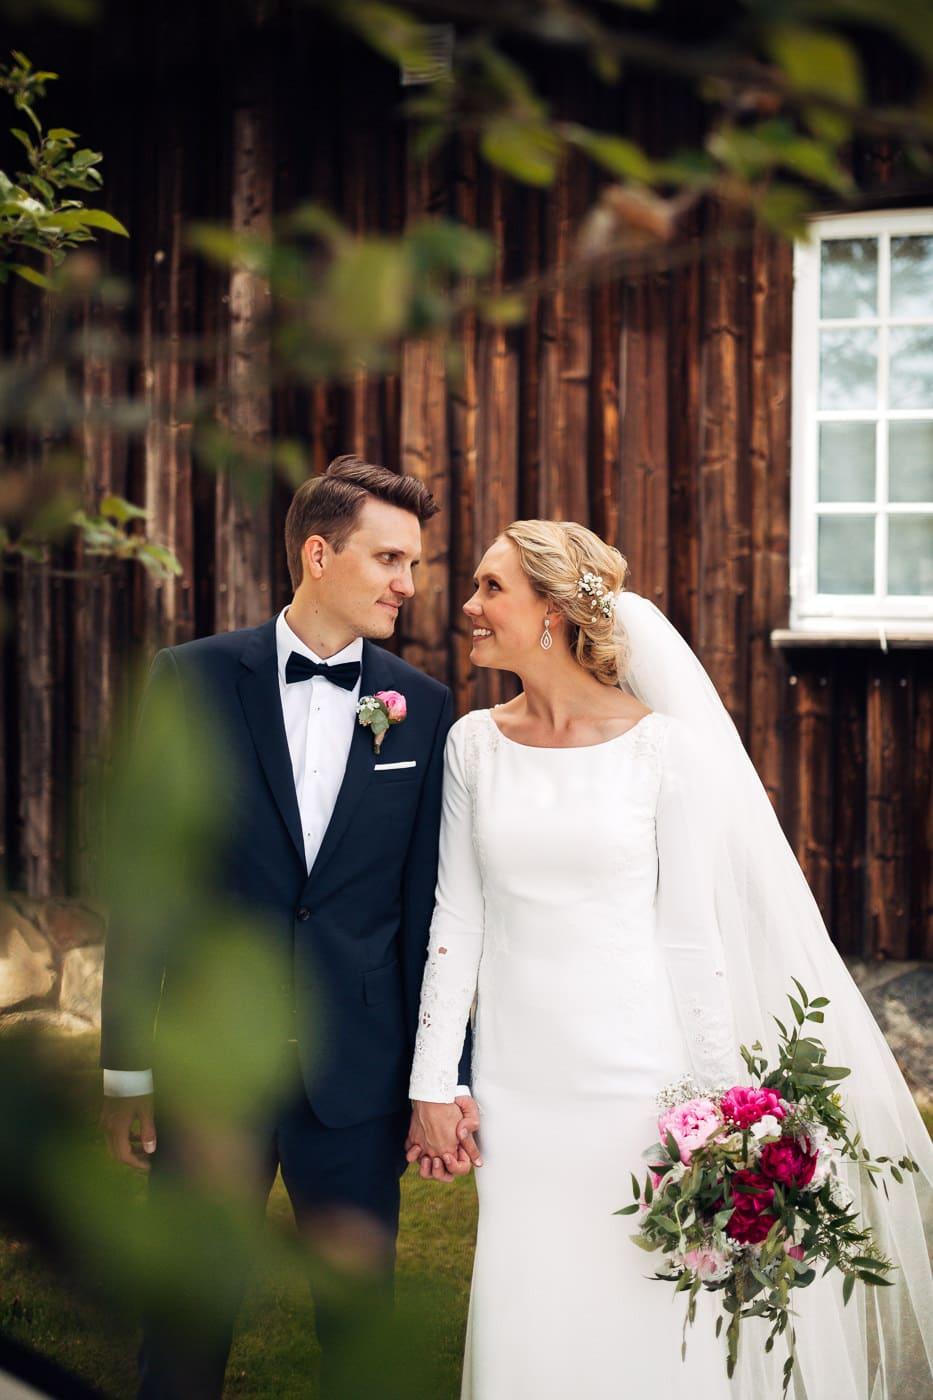 Karoline & Andreas - bryllup i Østfold med magiske detaljer Bryllup Fredrikstad Fotograf 34